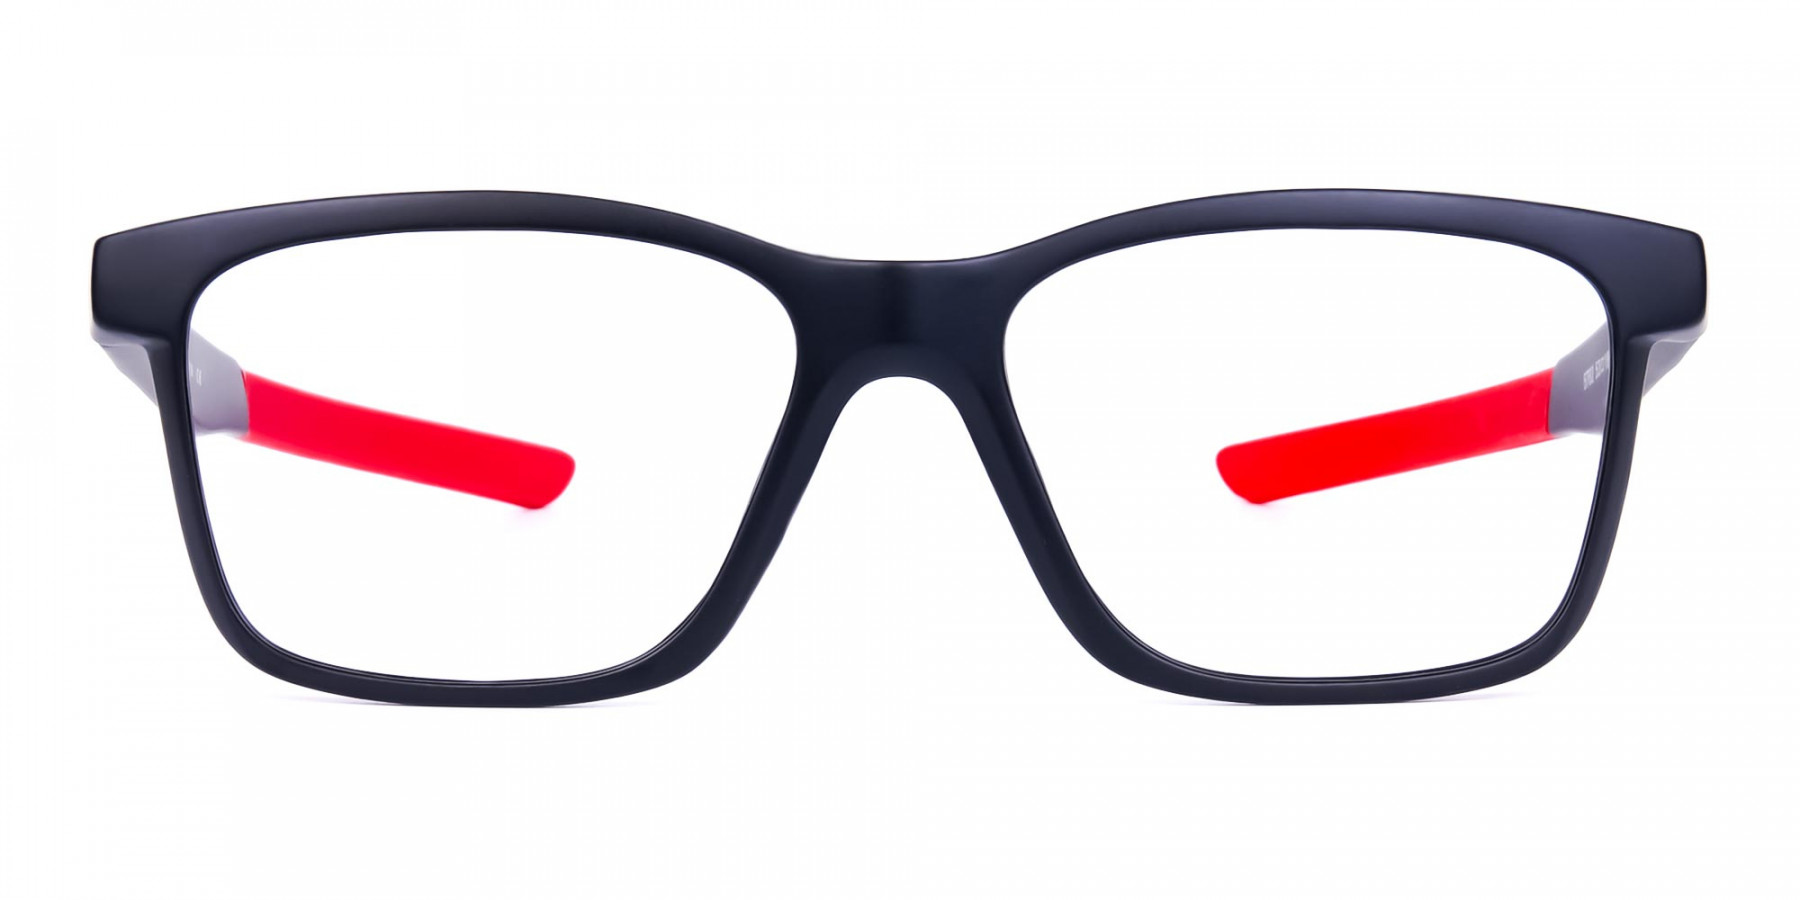 Red & Black Rectangular Rim Goggles For Biking-1